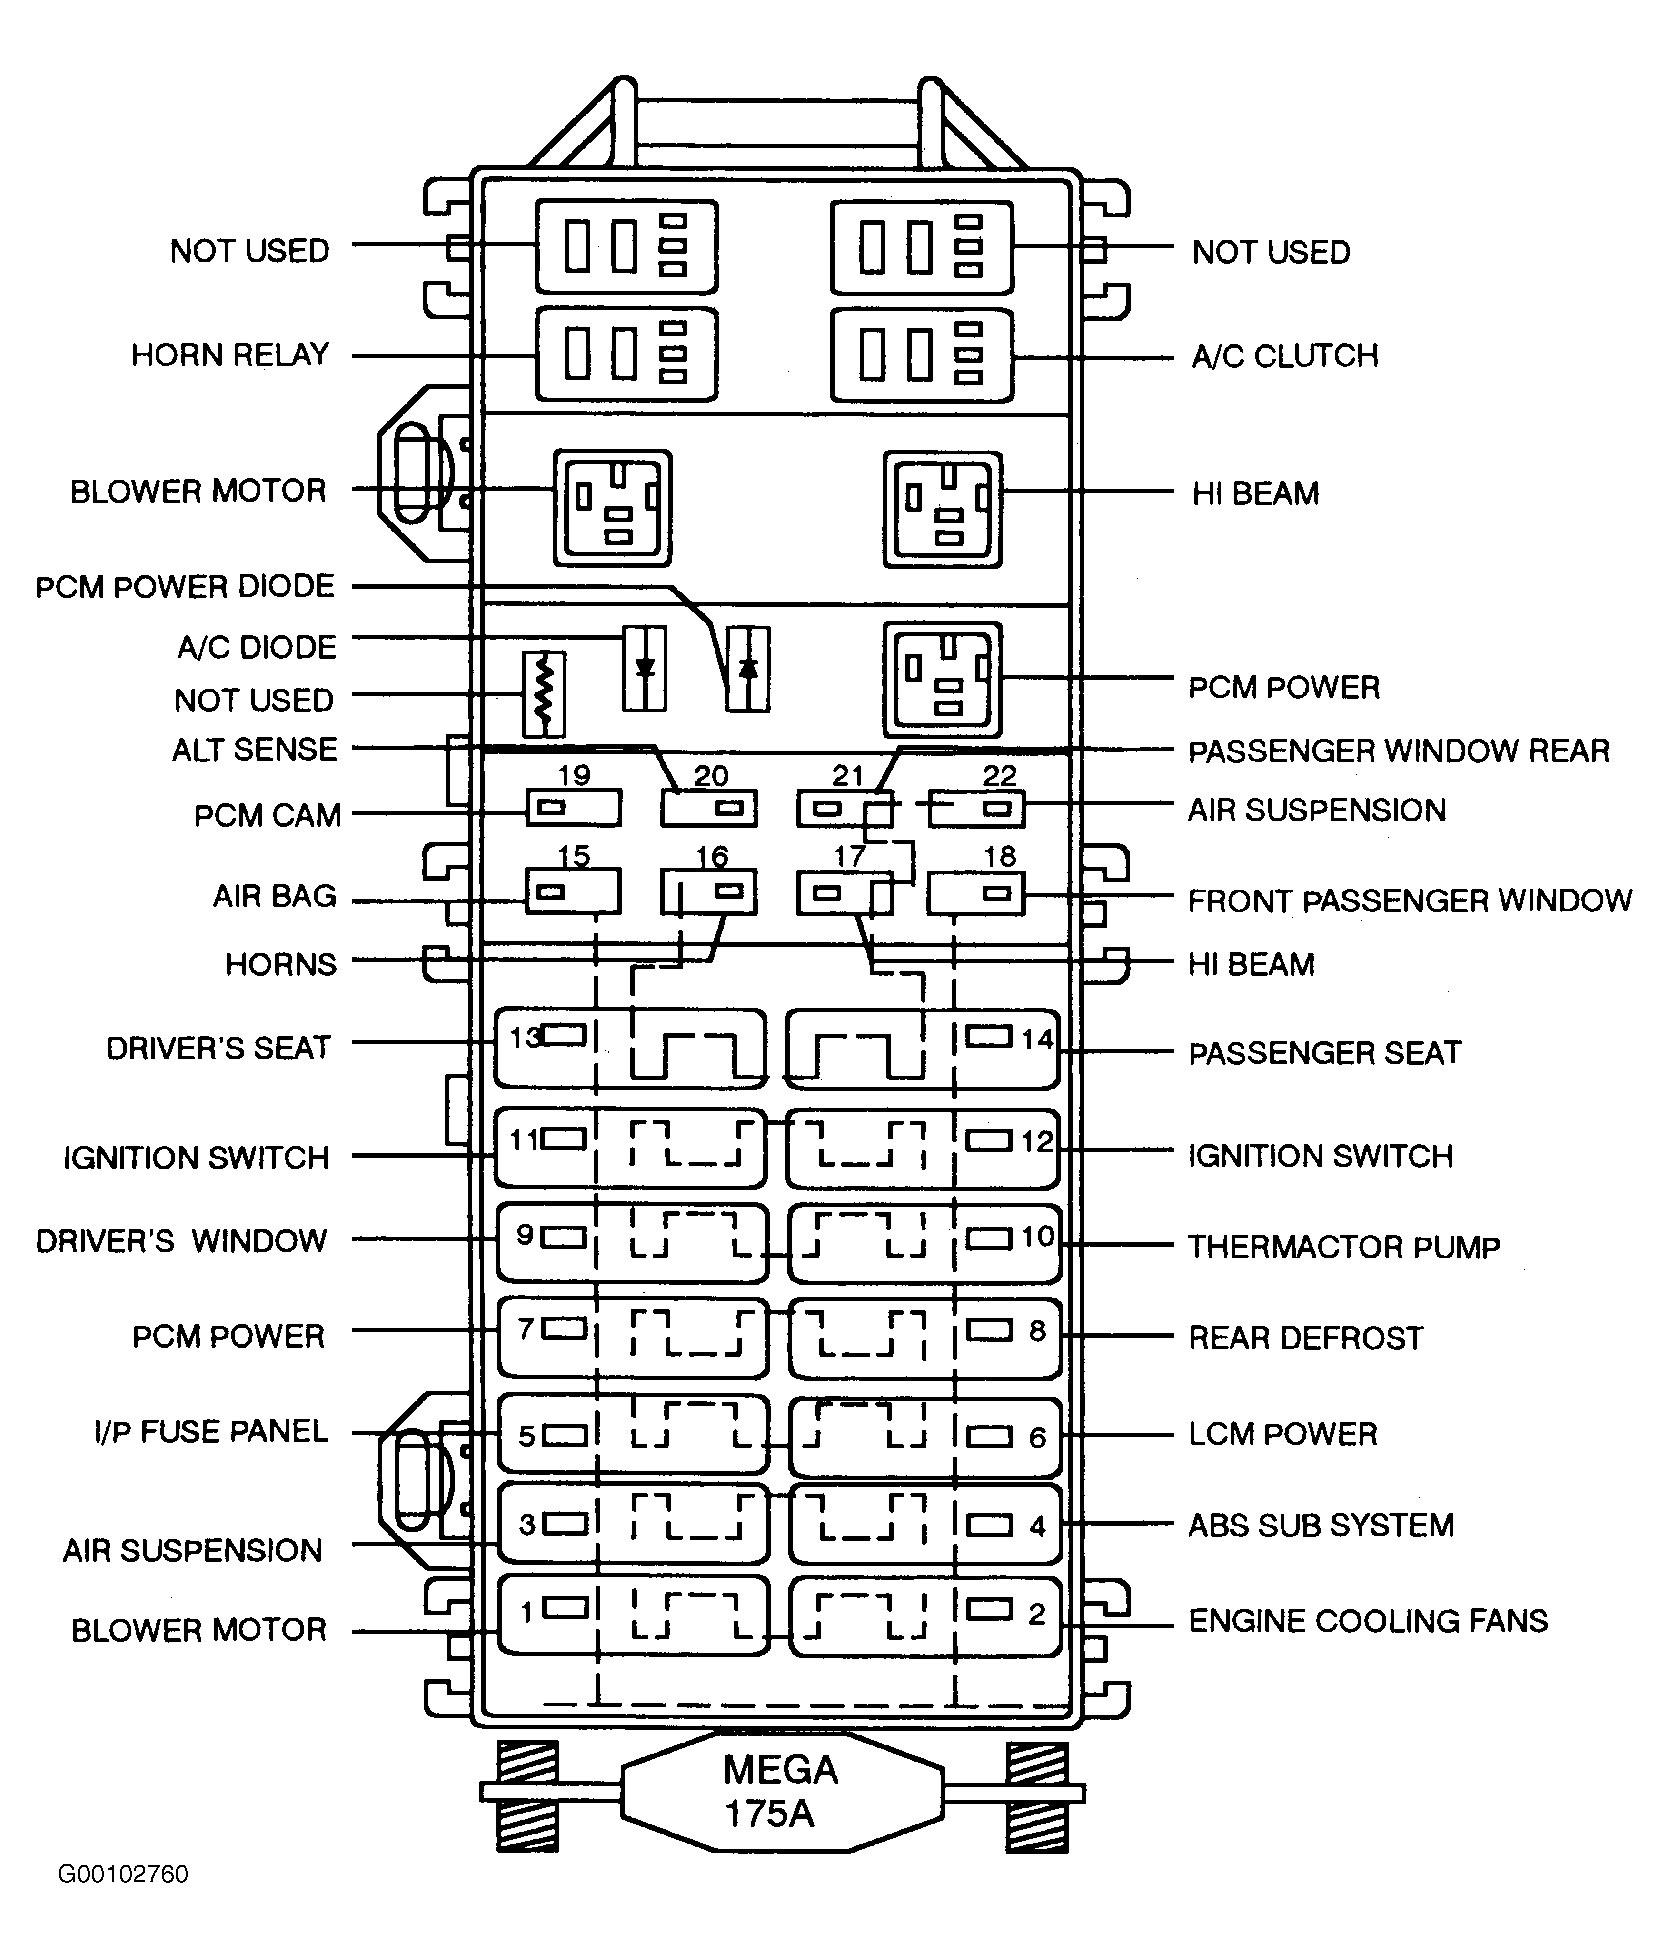 suzuki ignis fuse box location 6 7 jaun bergbahnen de u2022 rh 6 7 jaun bergbahnen de 2002 suzuki ignis fuse box location suzuki ignis fuse box layout